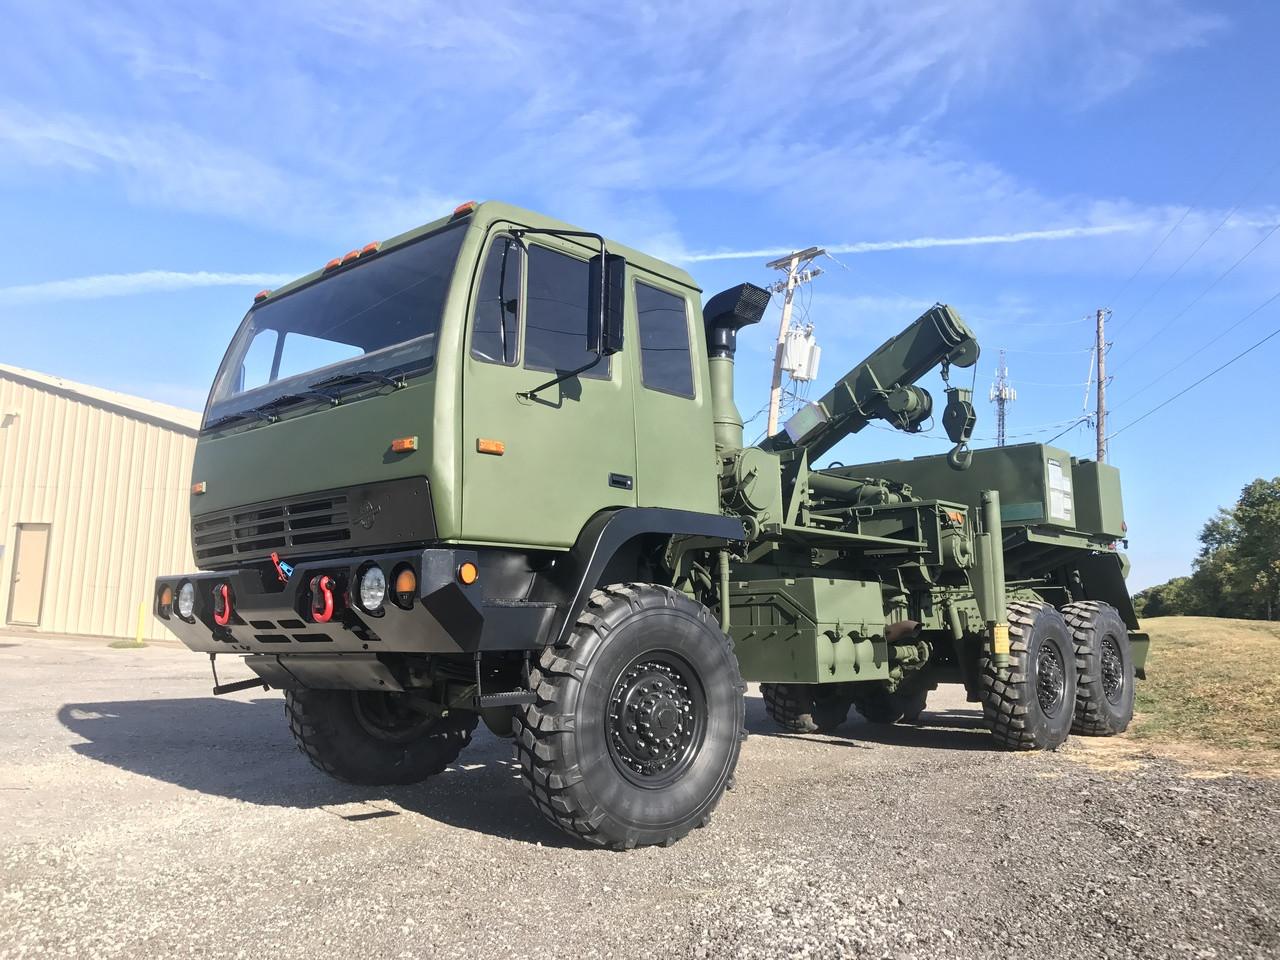 Stewart Amp Stevenson M1089 Military 6x6 Wrecker Truck